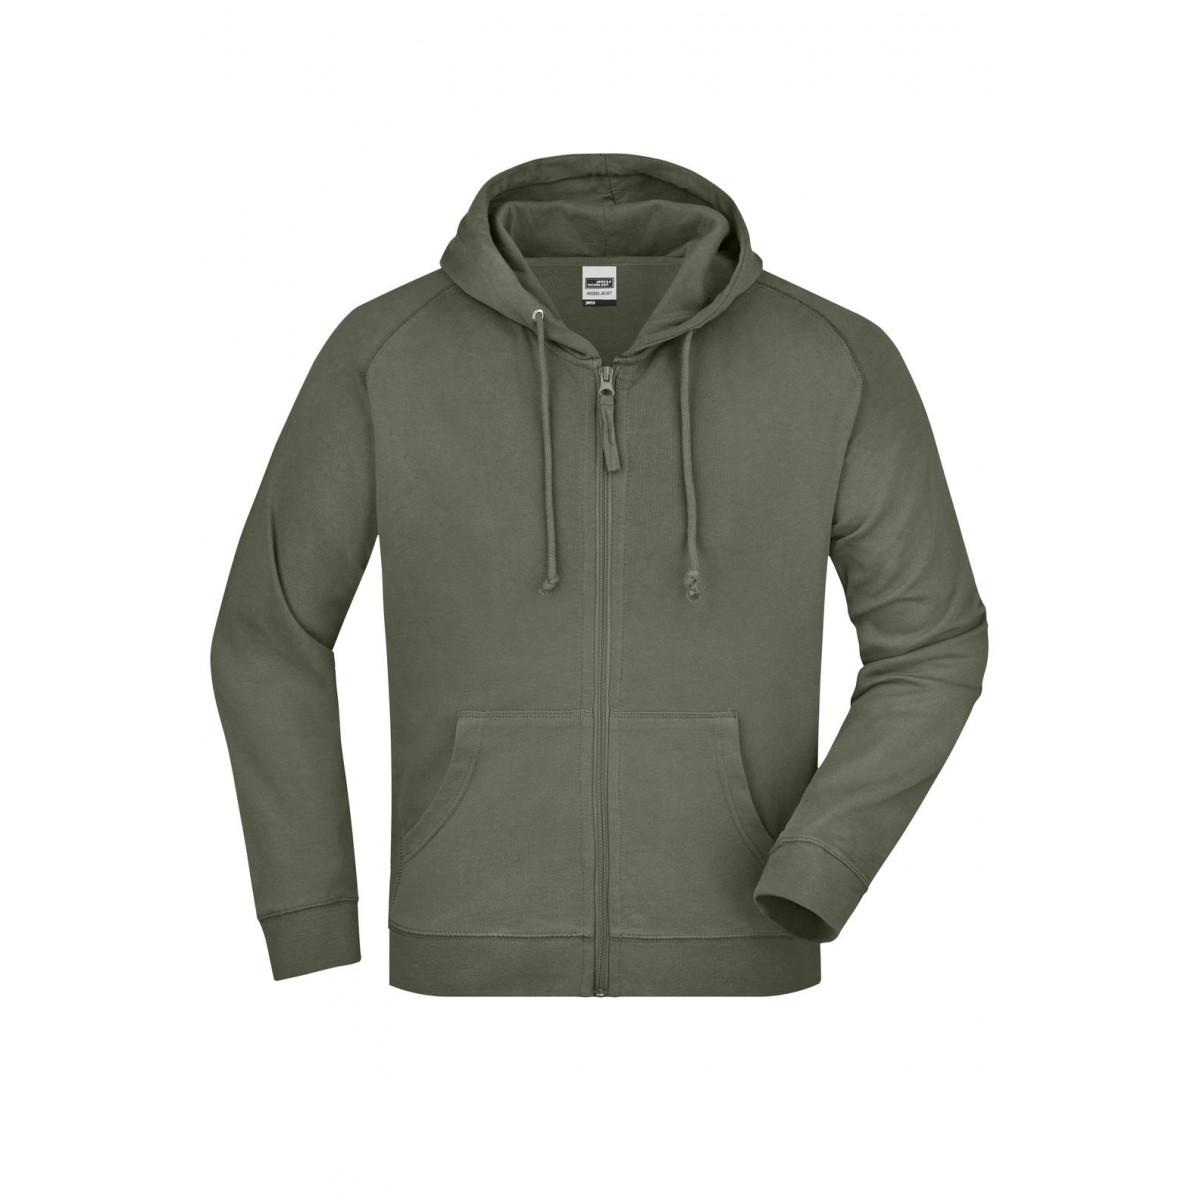 Толстовка мужская JN059 Hooded Jacket - Оливковый